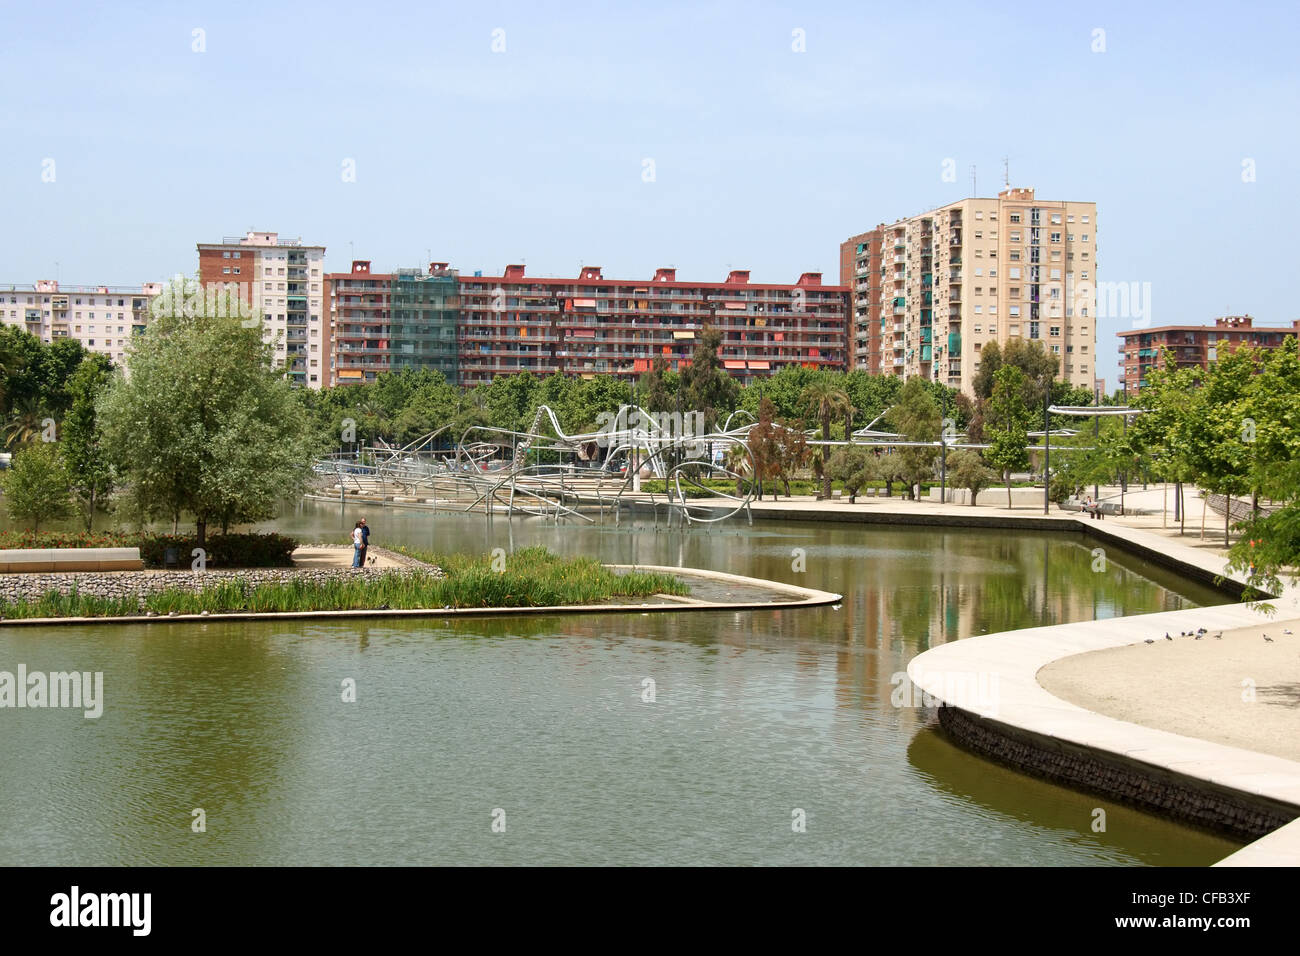 Parc de Diagonal Mar, Barcelona Stock Photo